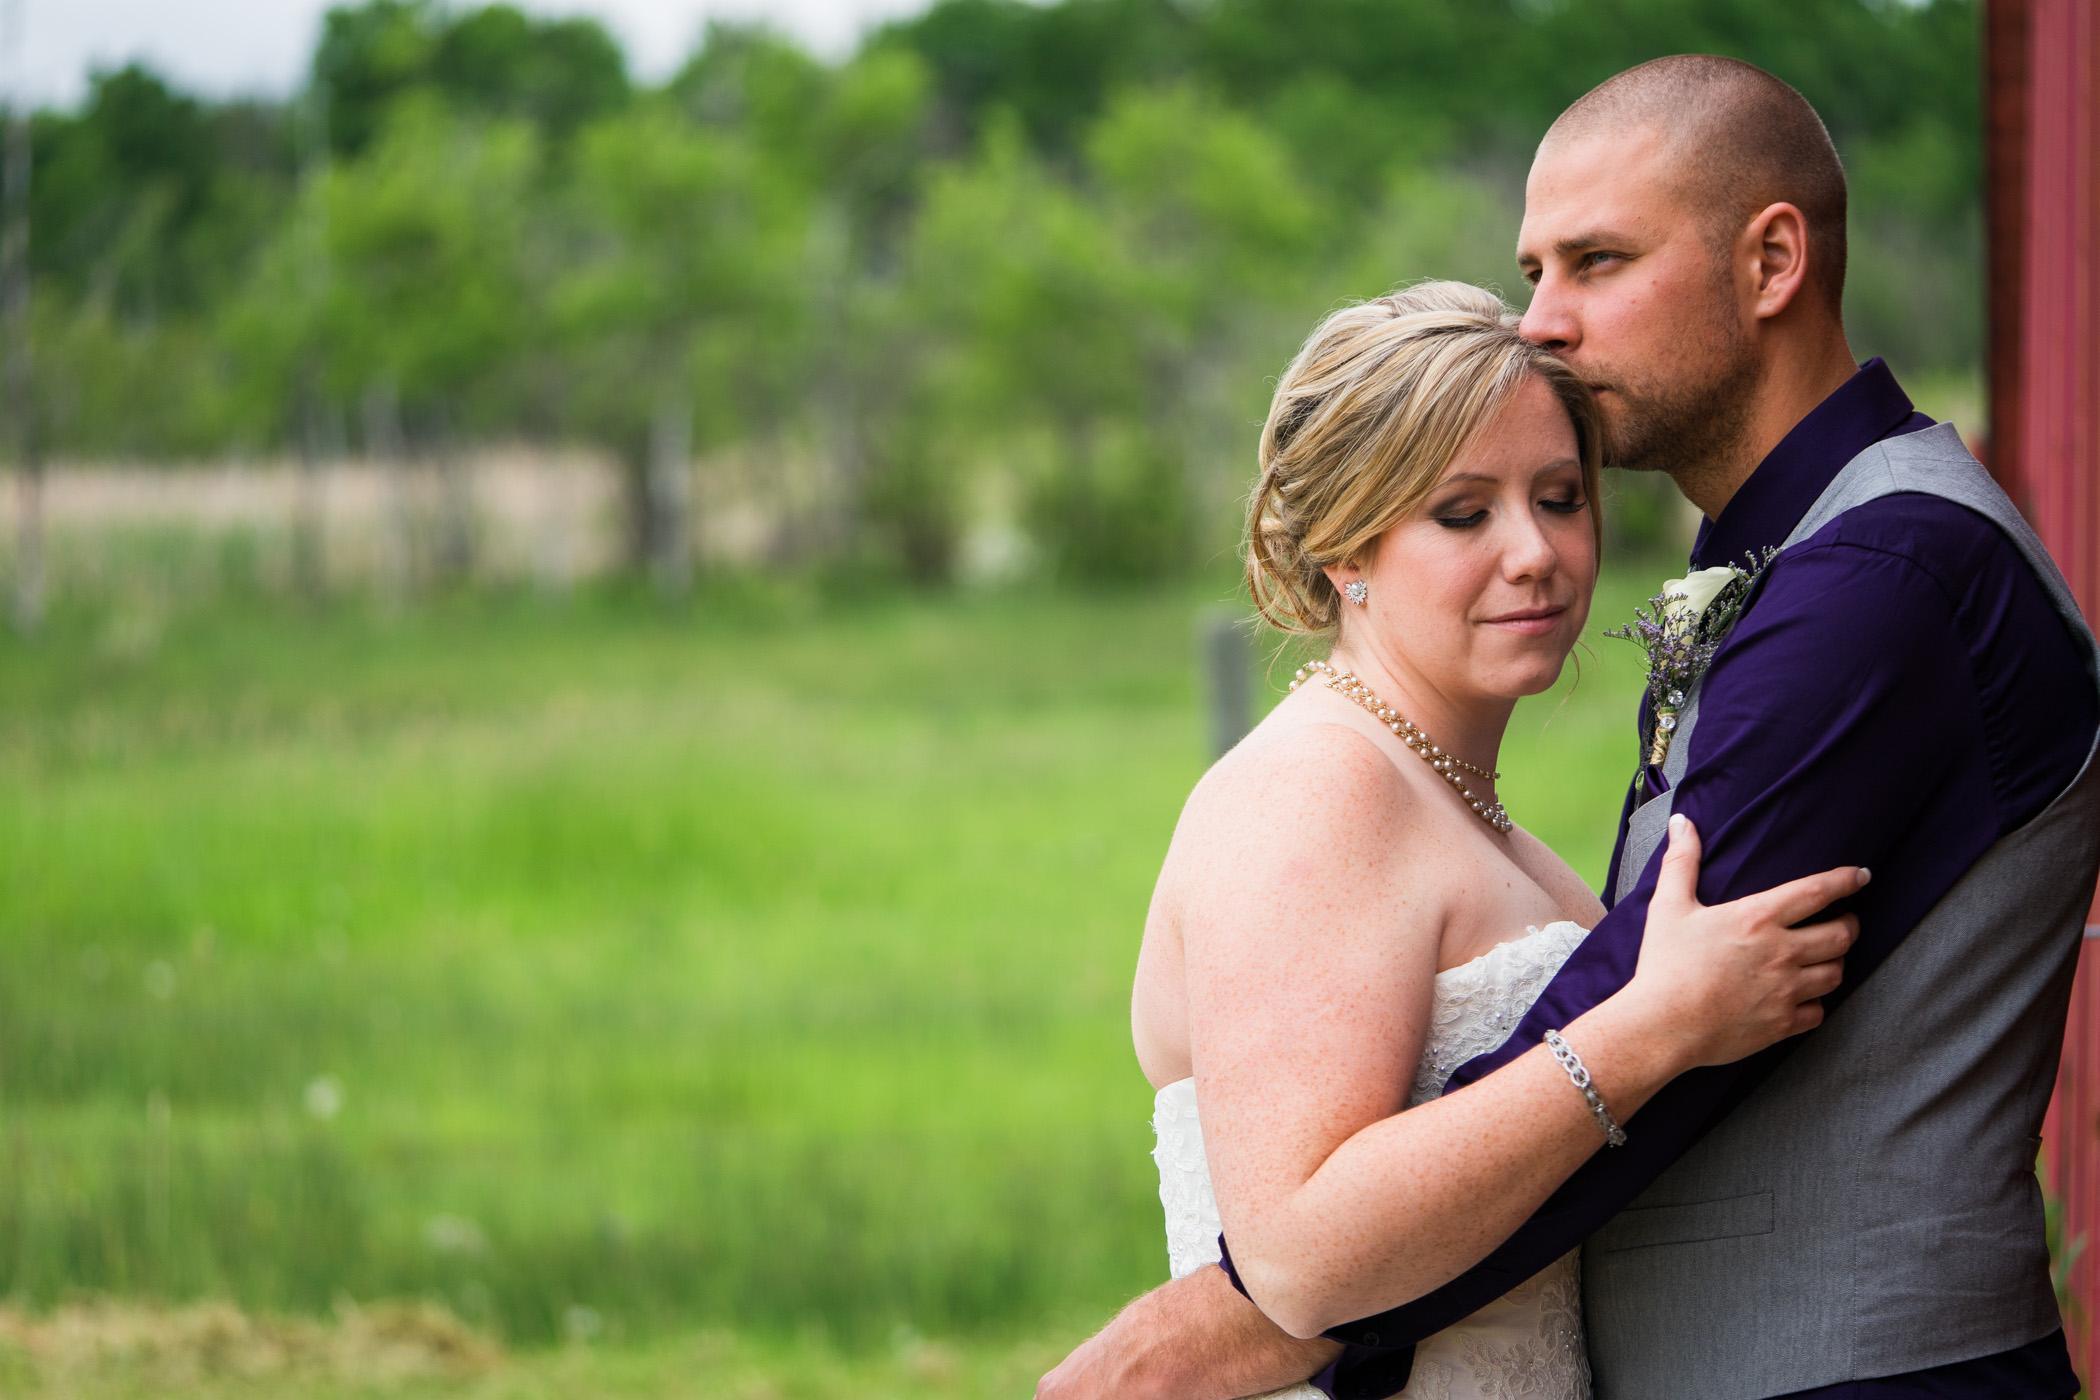 COJO Photo - Whitney and Steve - Wedding-473.jpg